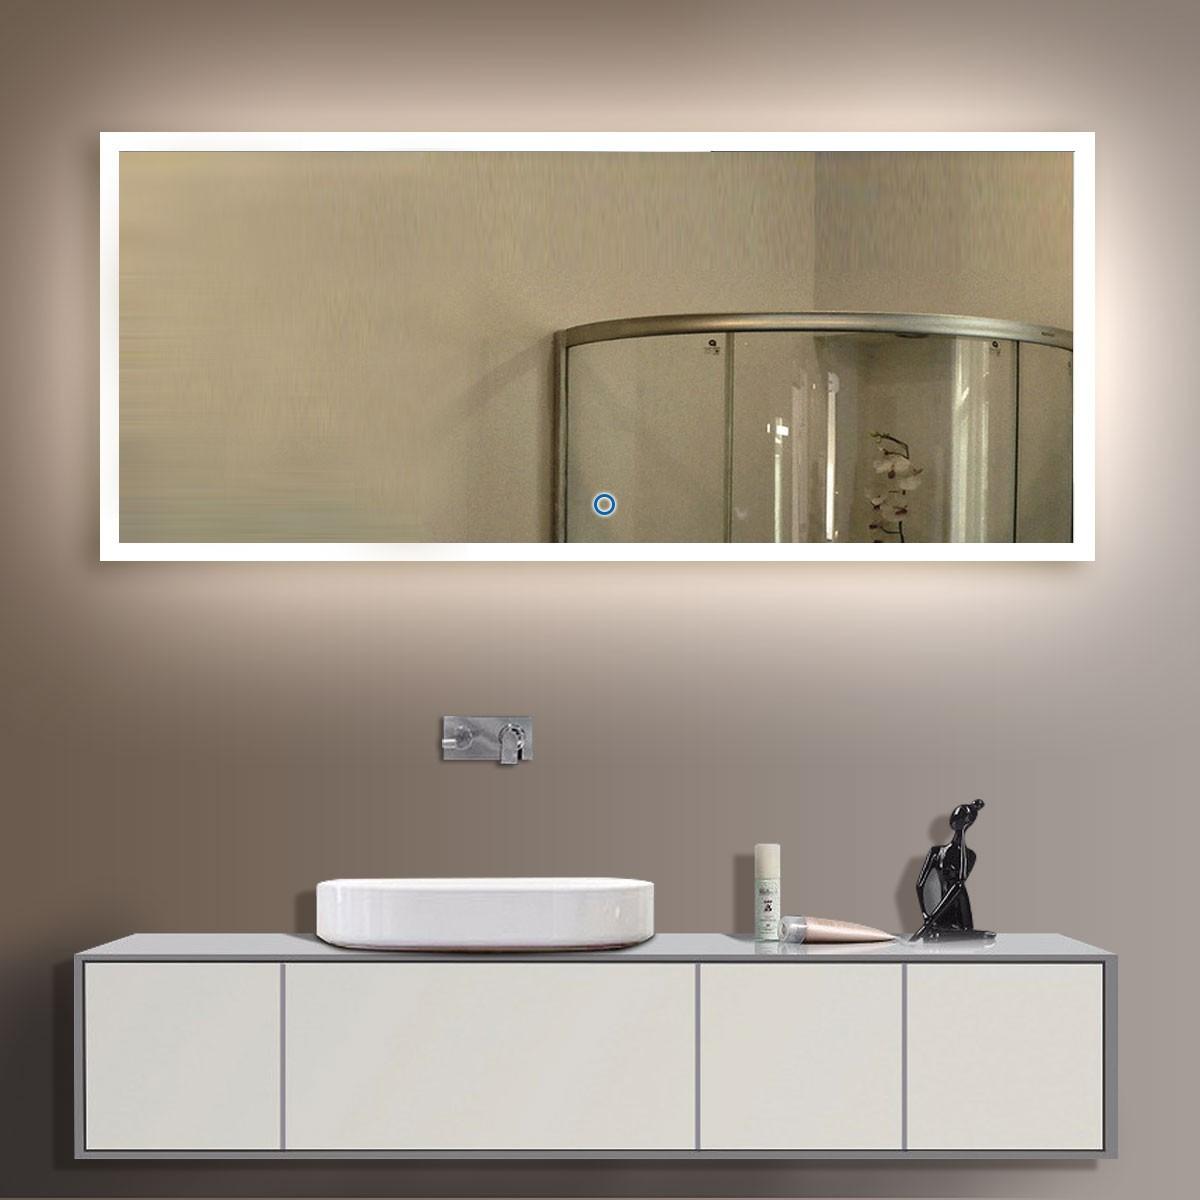 84 x 40 po miroir de salle de bain LED horizontal avec bouton tactile (DK-OD-N031-A)